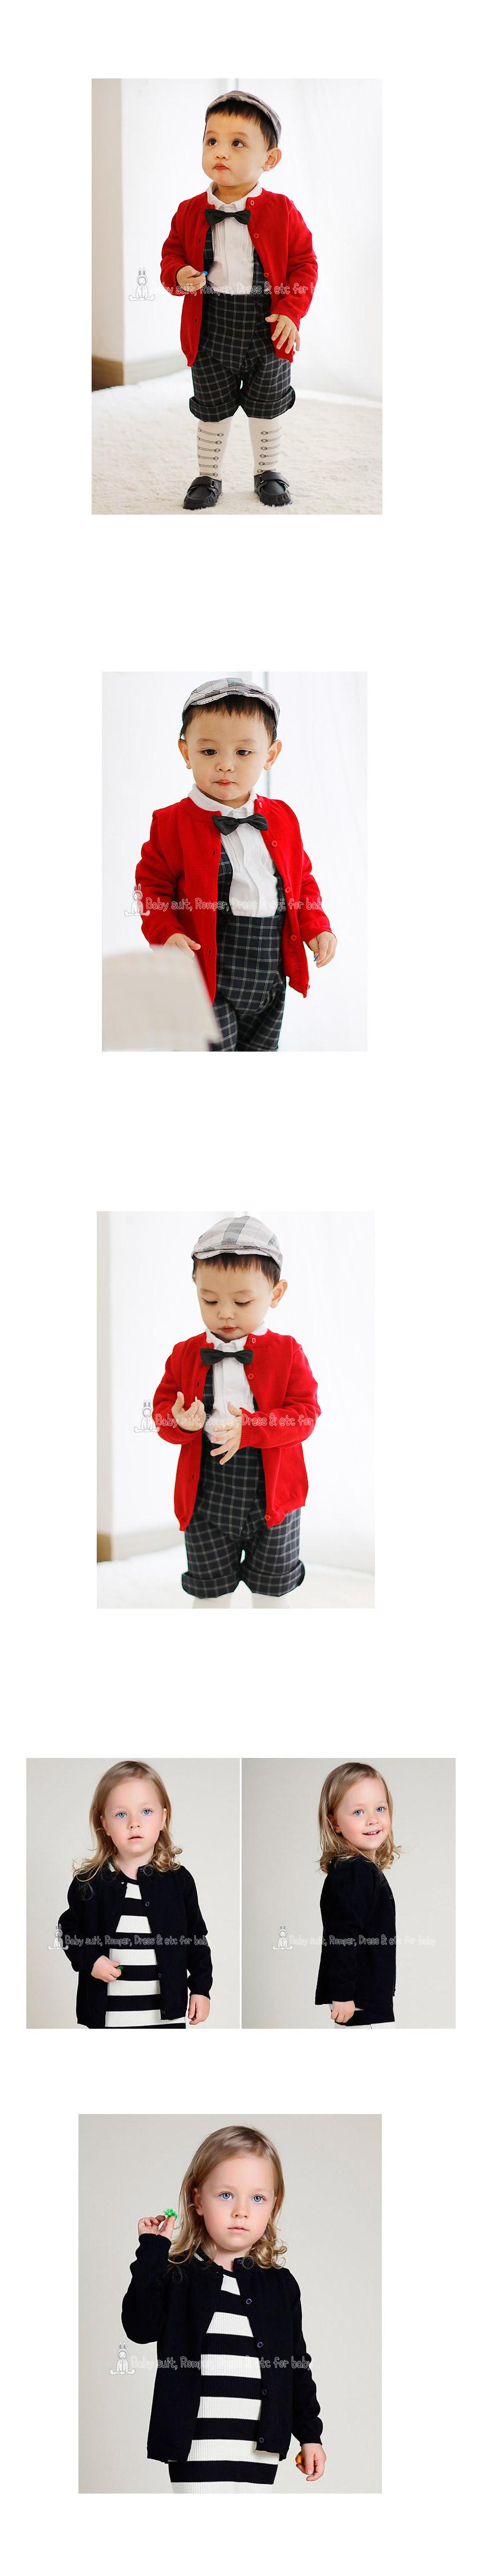 [ BABYMAX ] C031 Round knit cardigan